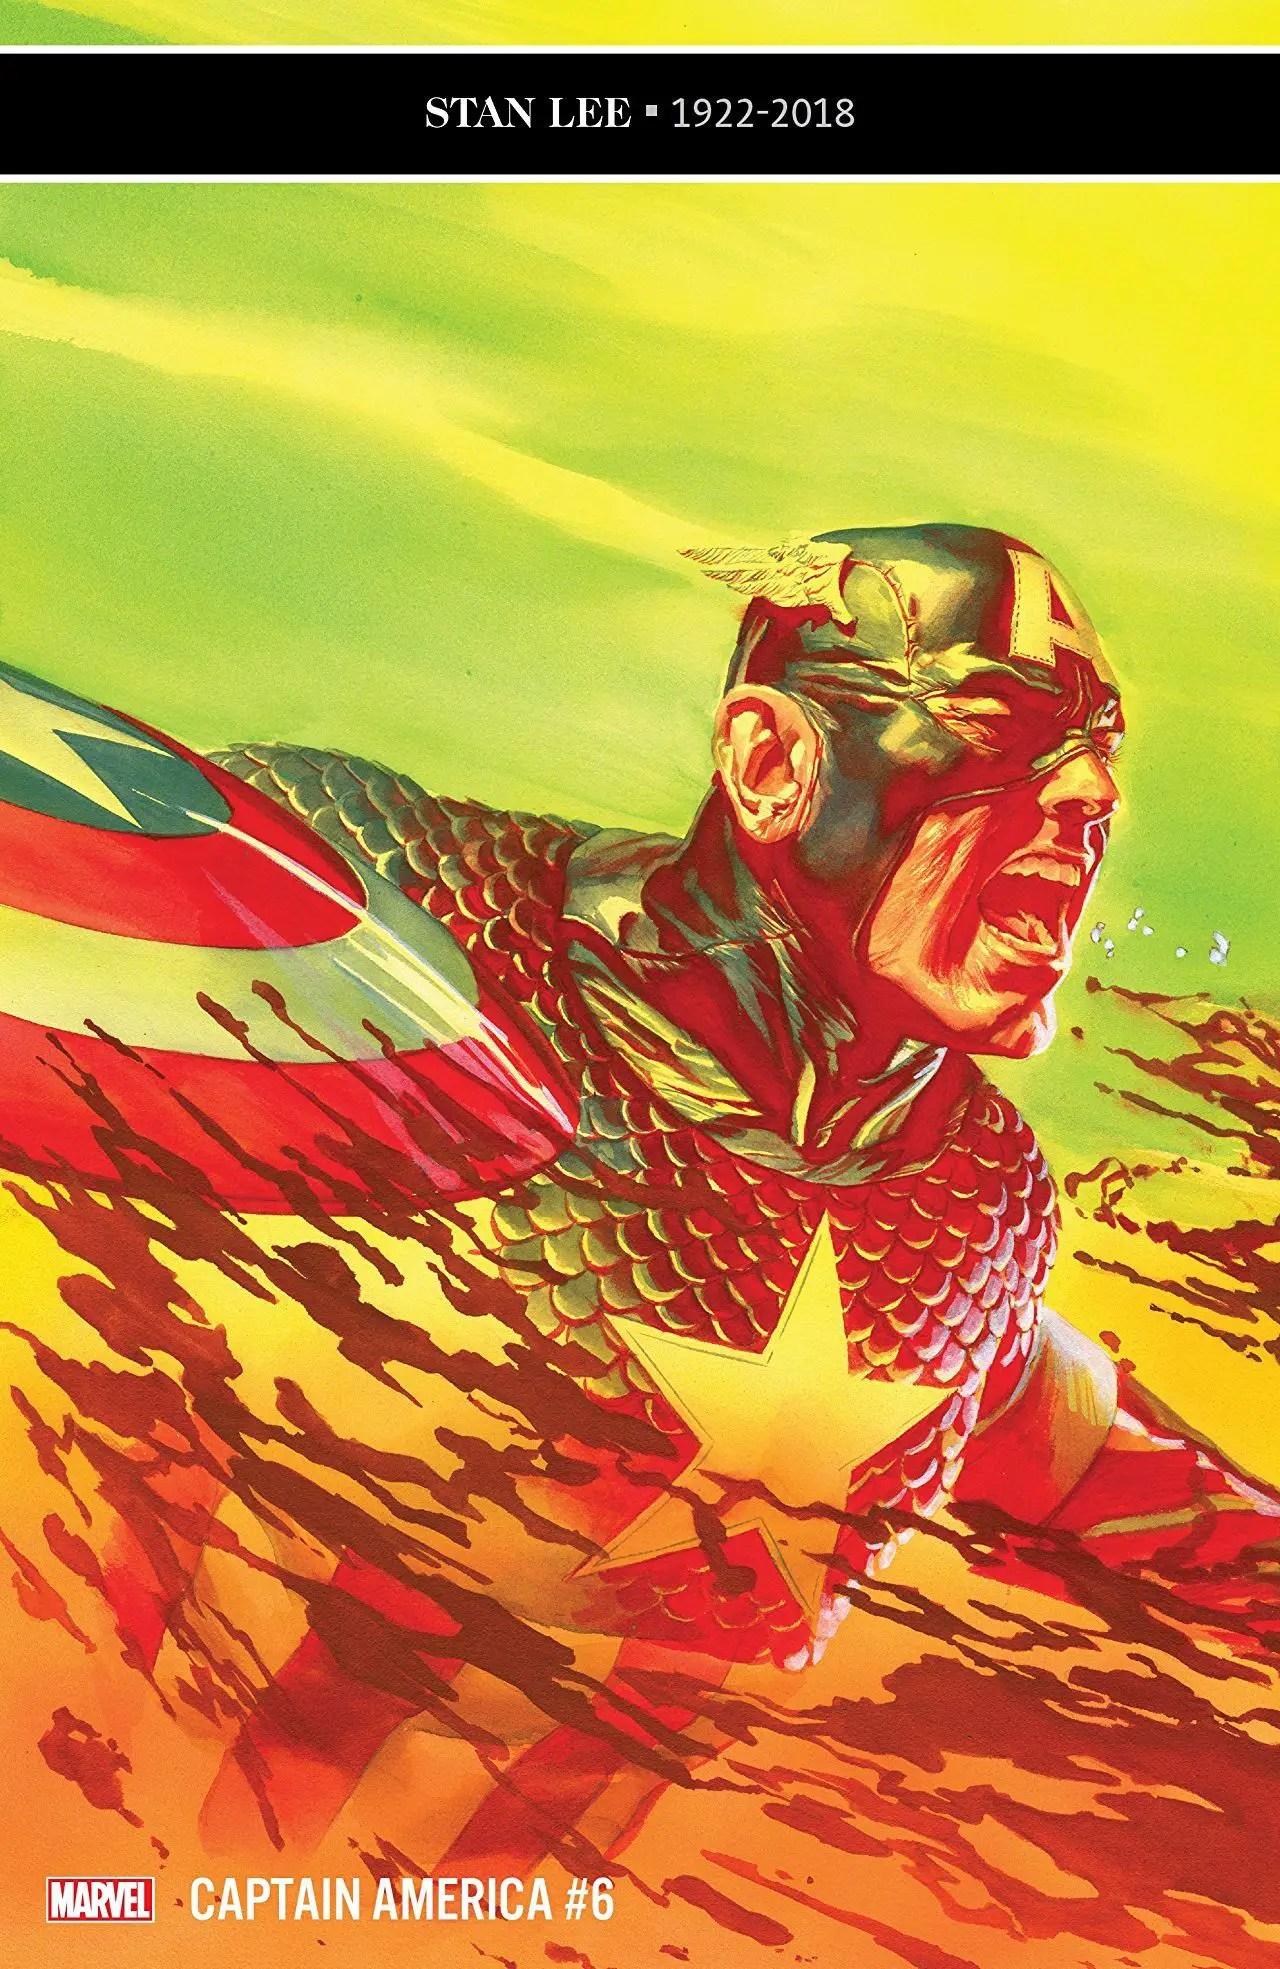 Captain America #6 review: Not so enchanting